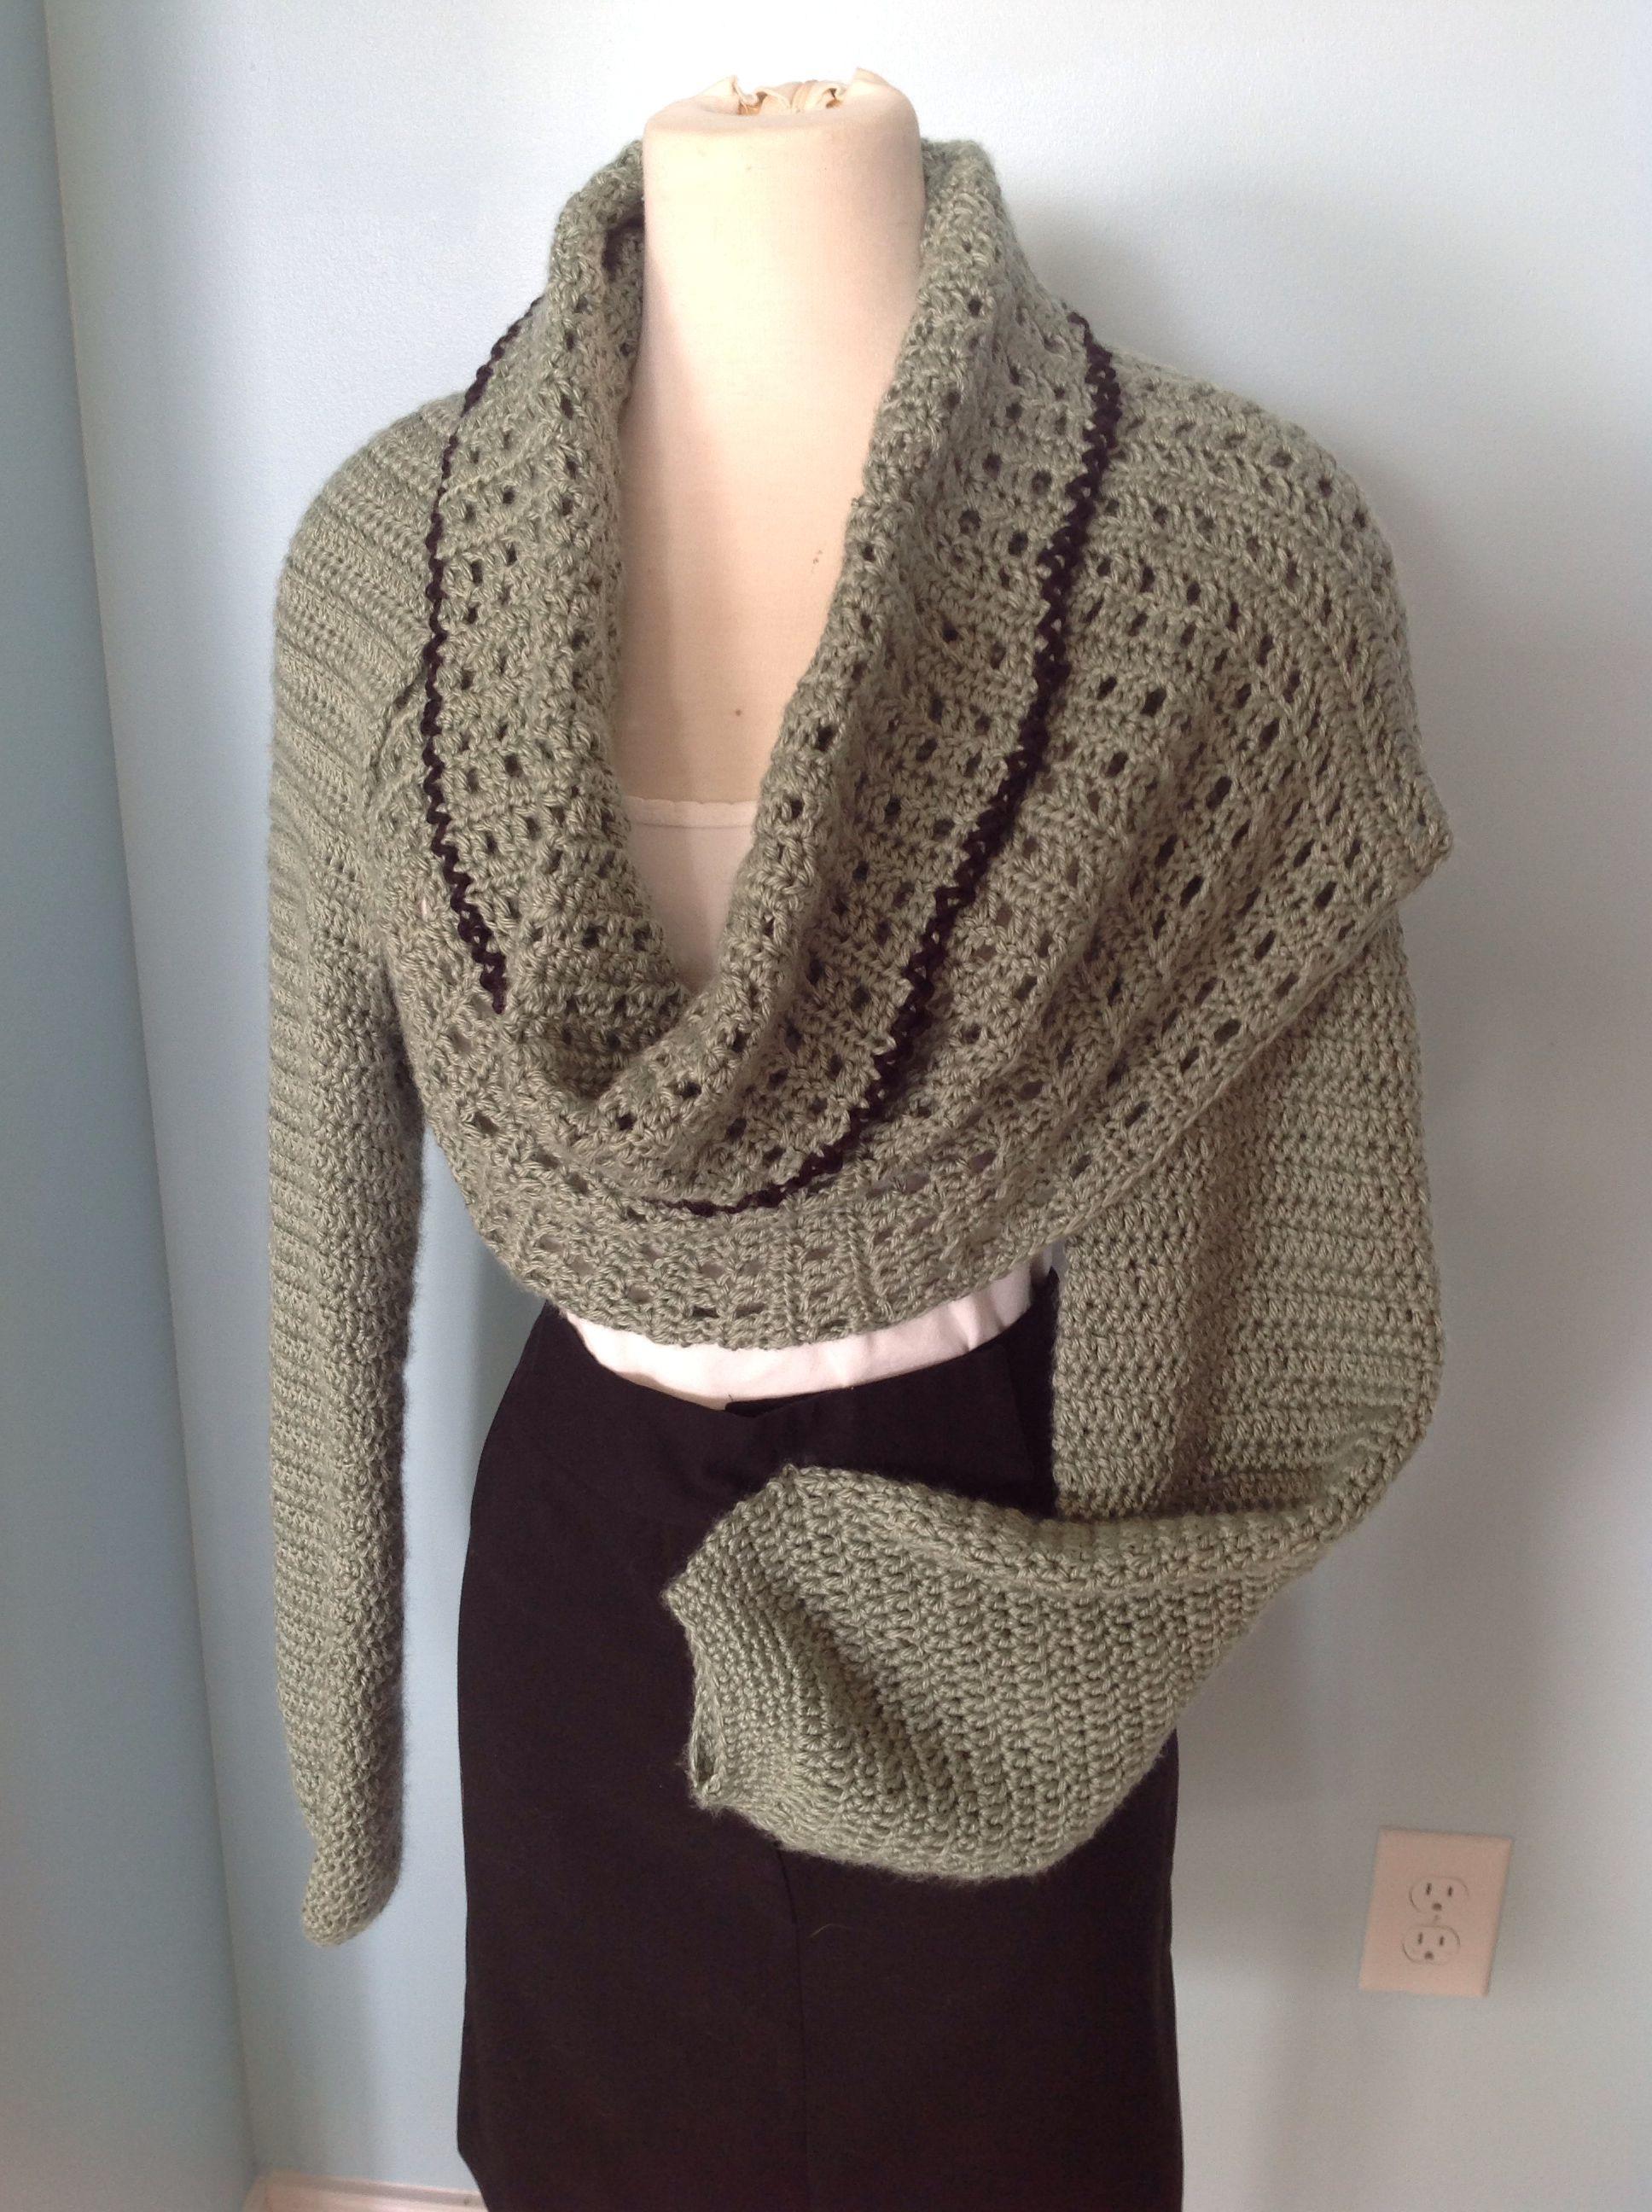 Crochet, long sleeve wrap cowl. $75